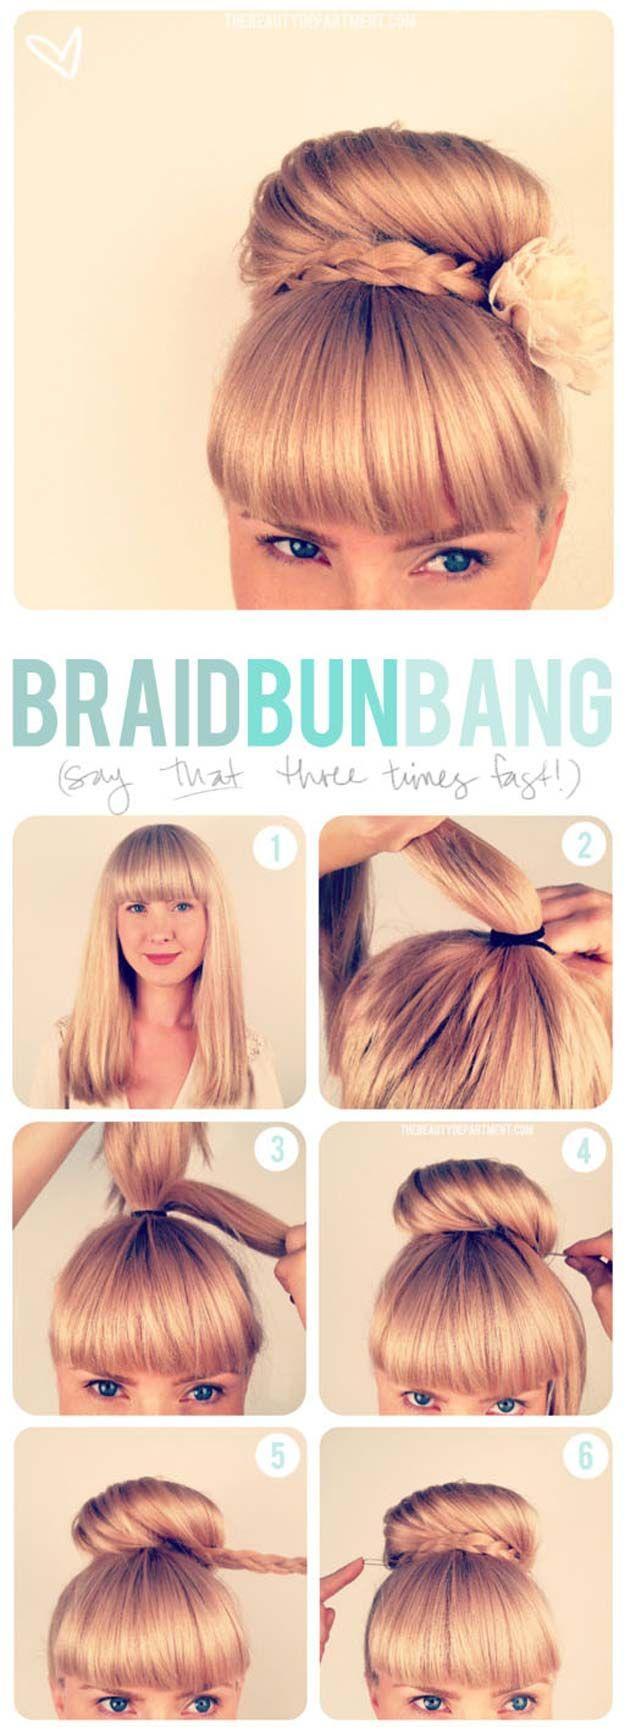 creative hair tutorials that will make you say